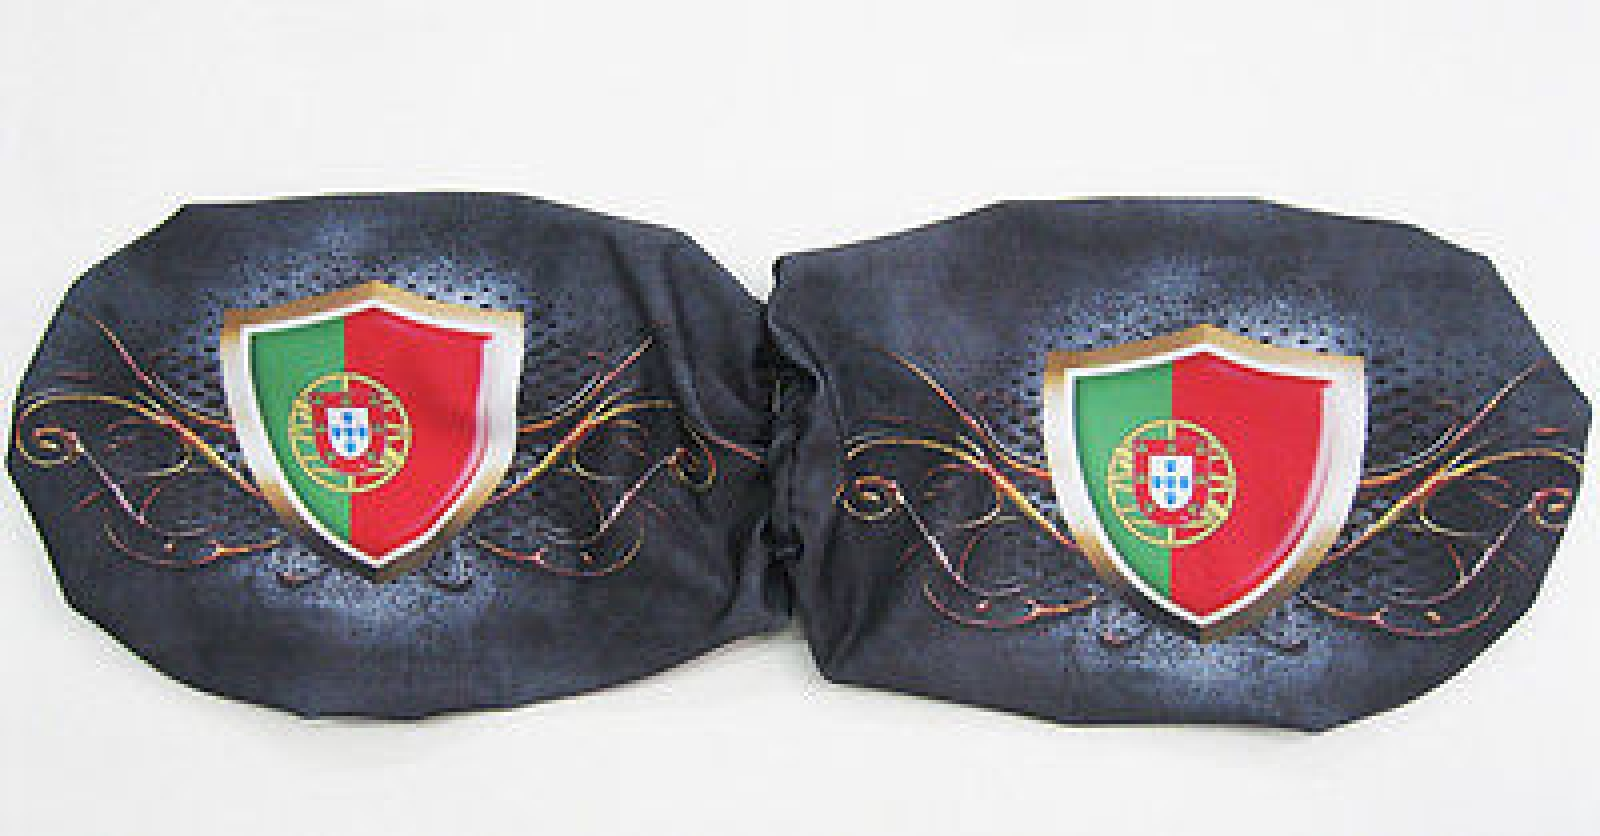 Auto spiegel r ckspiegel car bikini em 2016 portugal fahne for Spiegel und fahne